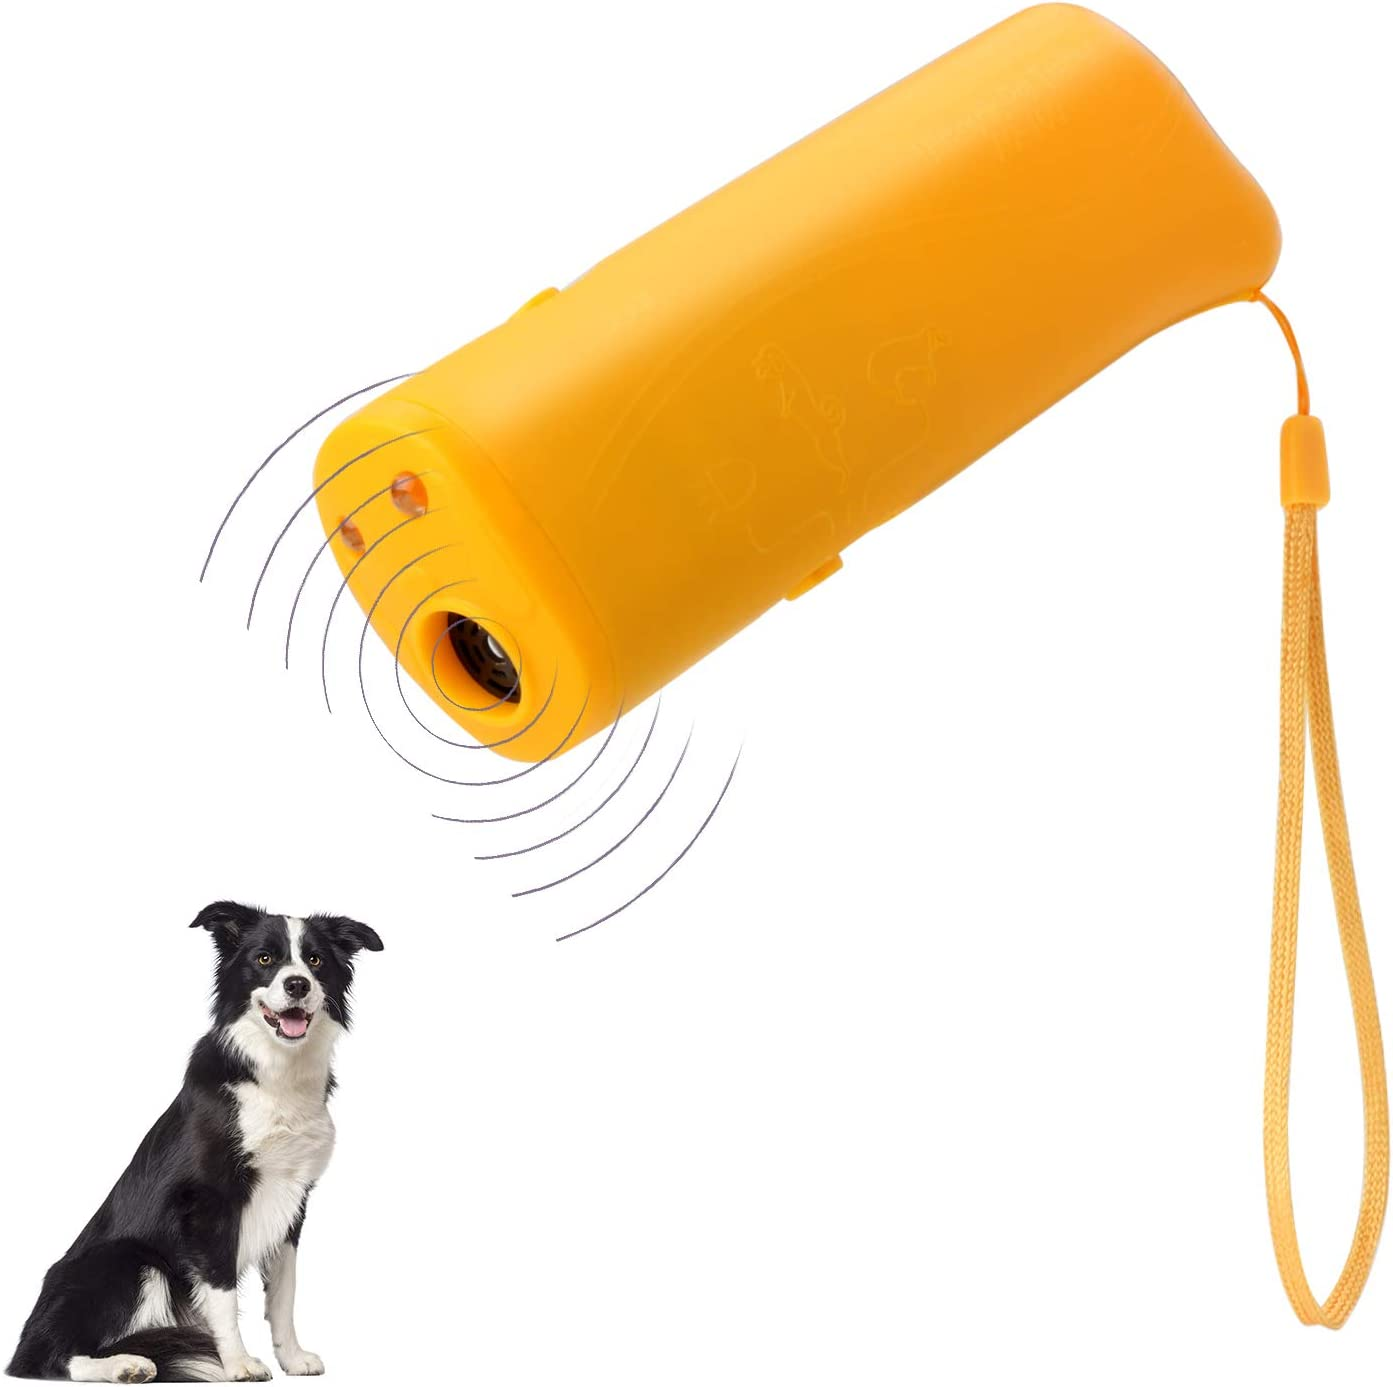 B07D32YTSL POVAD Dog Barking Stop 3 in 1 Anti Ultrasonic Dog Repeller Bark Handheld Dog Trainer Device Safe Pet Training Devices (Yellow) 61maD-g5kQL